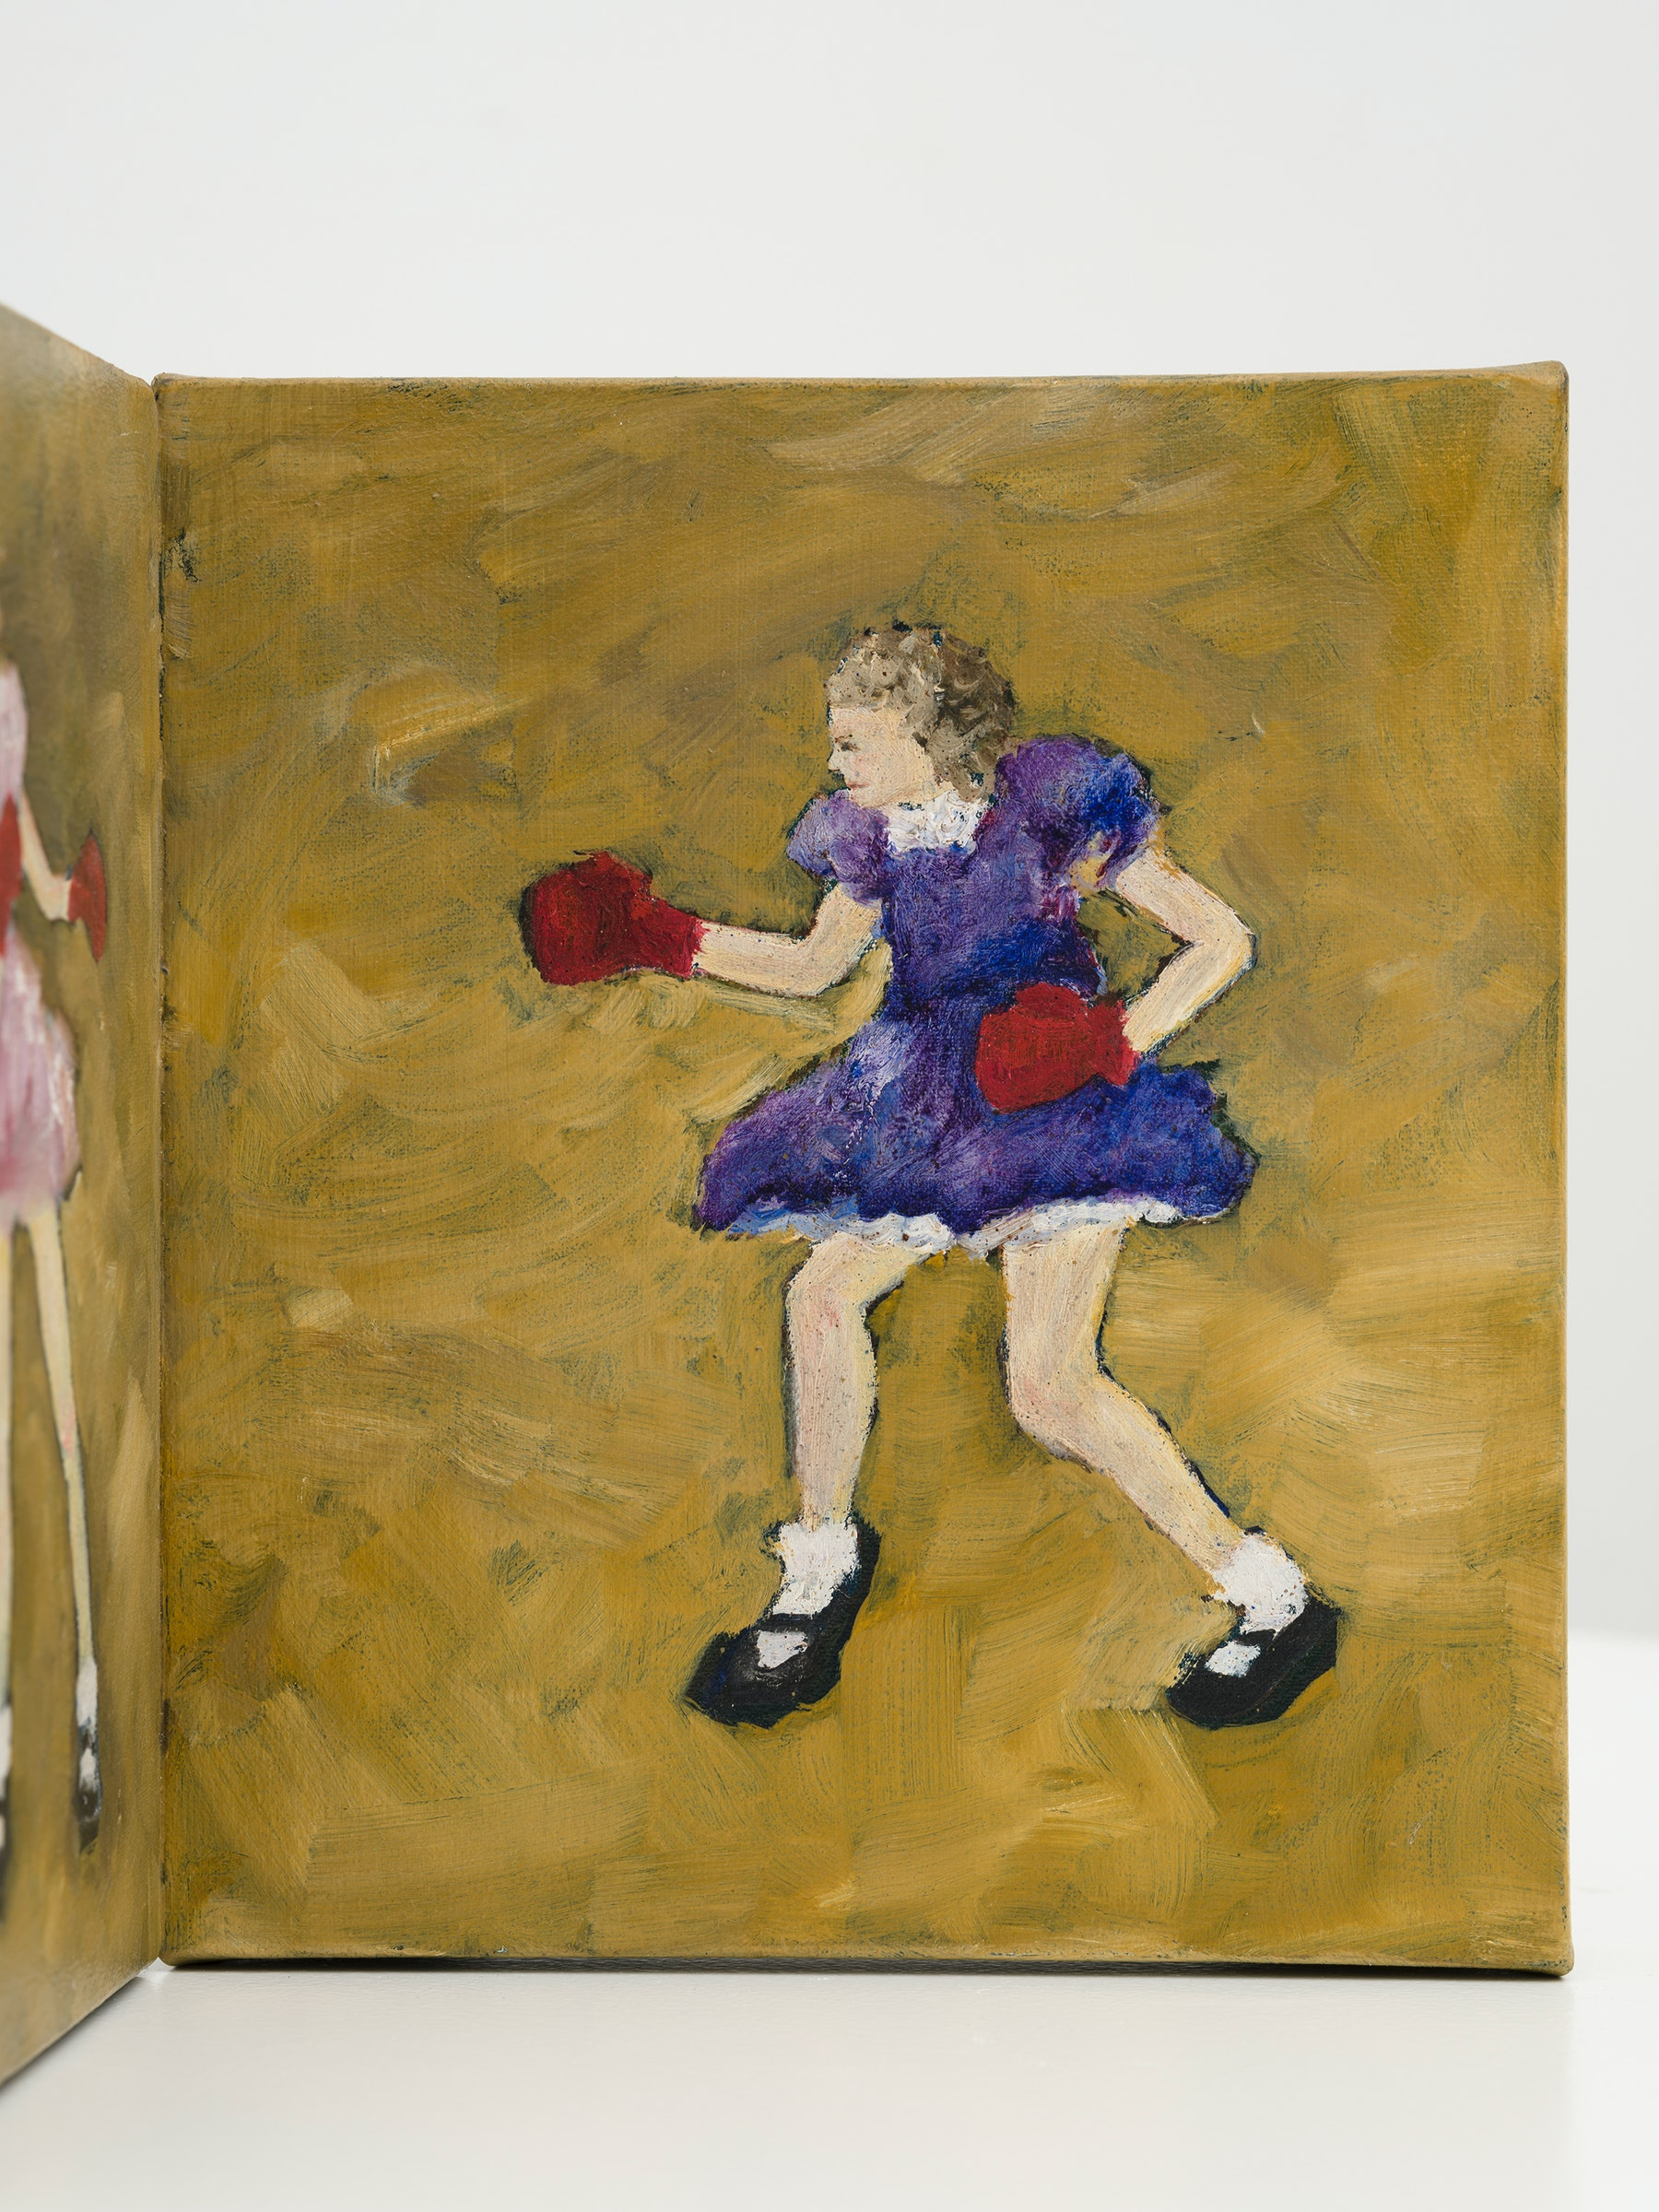 "Kim Dingle ""Corner Girls,"" 1992 Oil on Belgian canvas 9 ³⁄₄"" x 14 ¹⁄₂"" x 7"" [HxWxD] (24.77 x 36.83 x 17.78 cm) Inventory #DIN335 Courtesy of Vielmetter Los Angeles Photo credit: Jeff McLane"